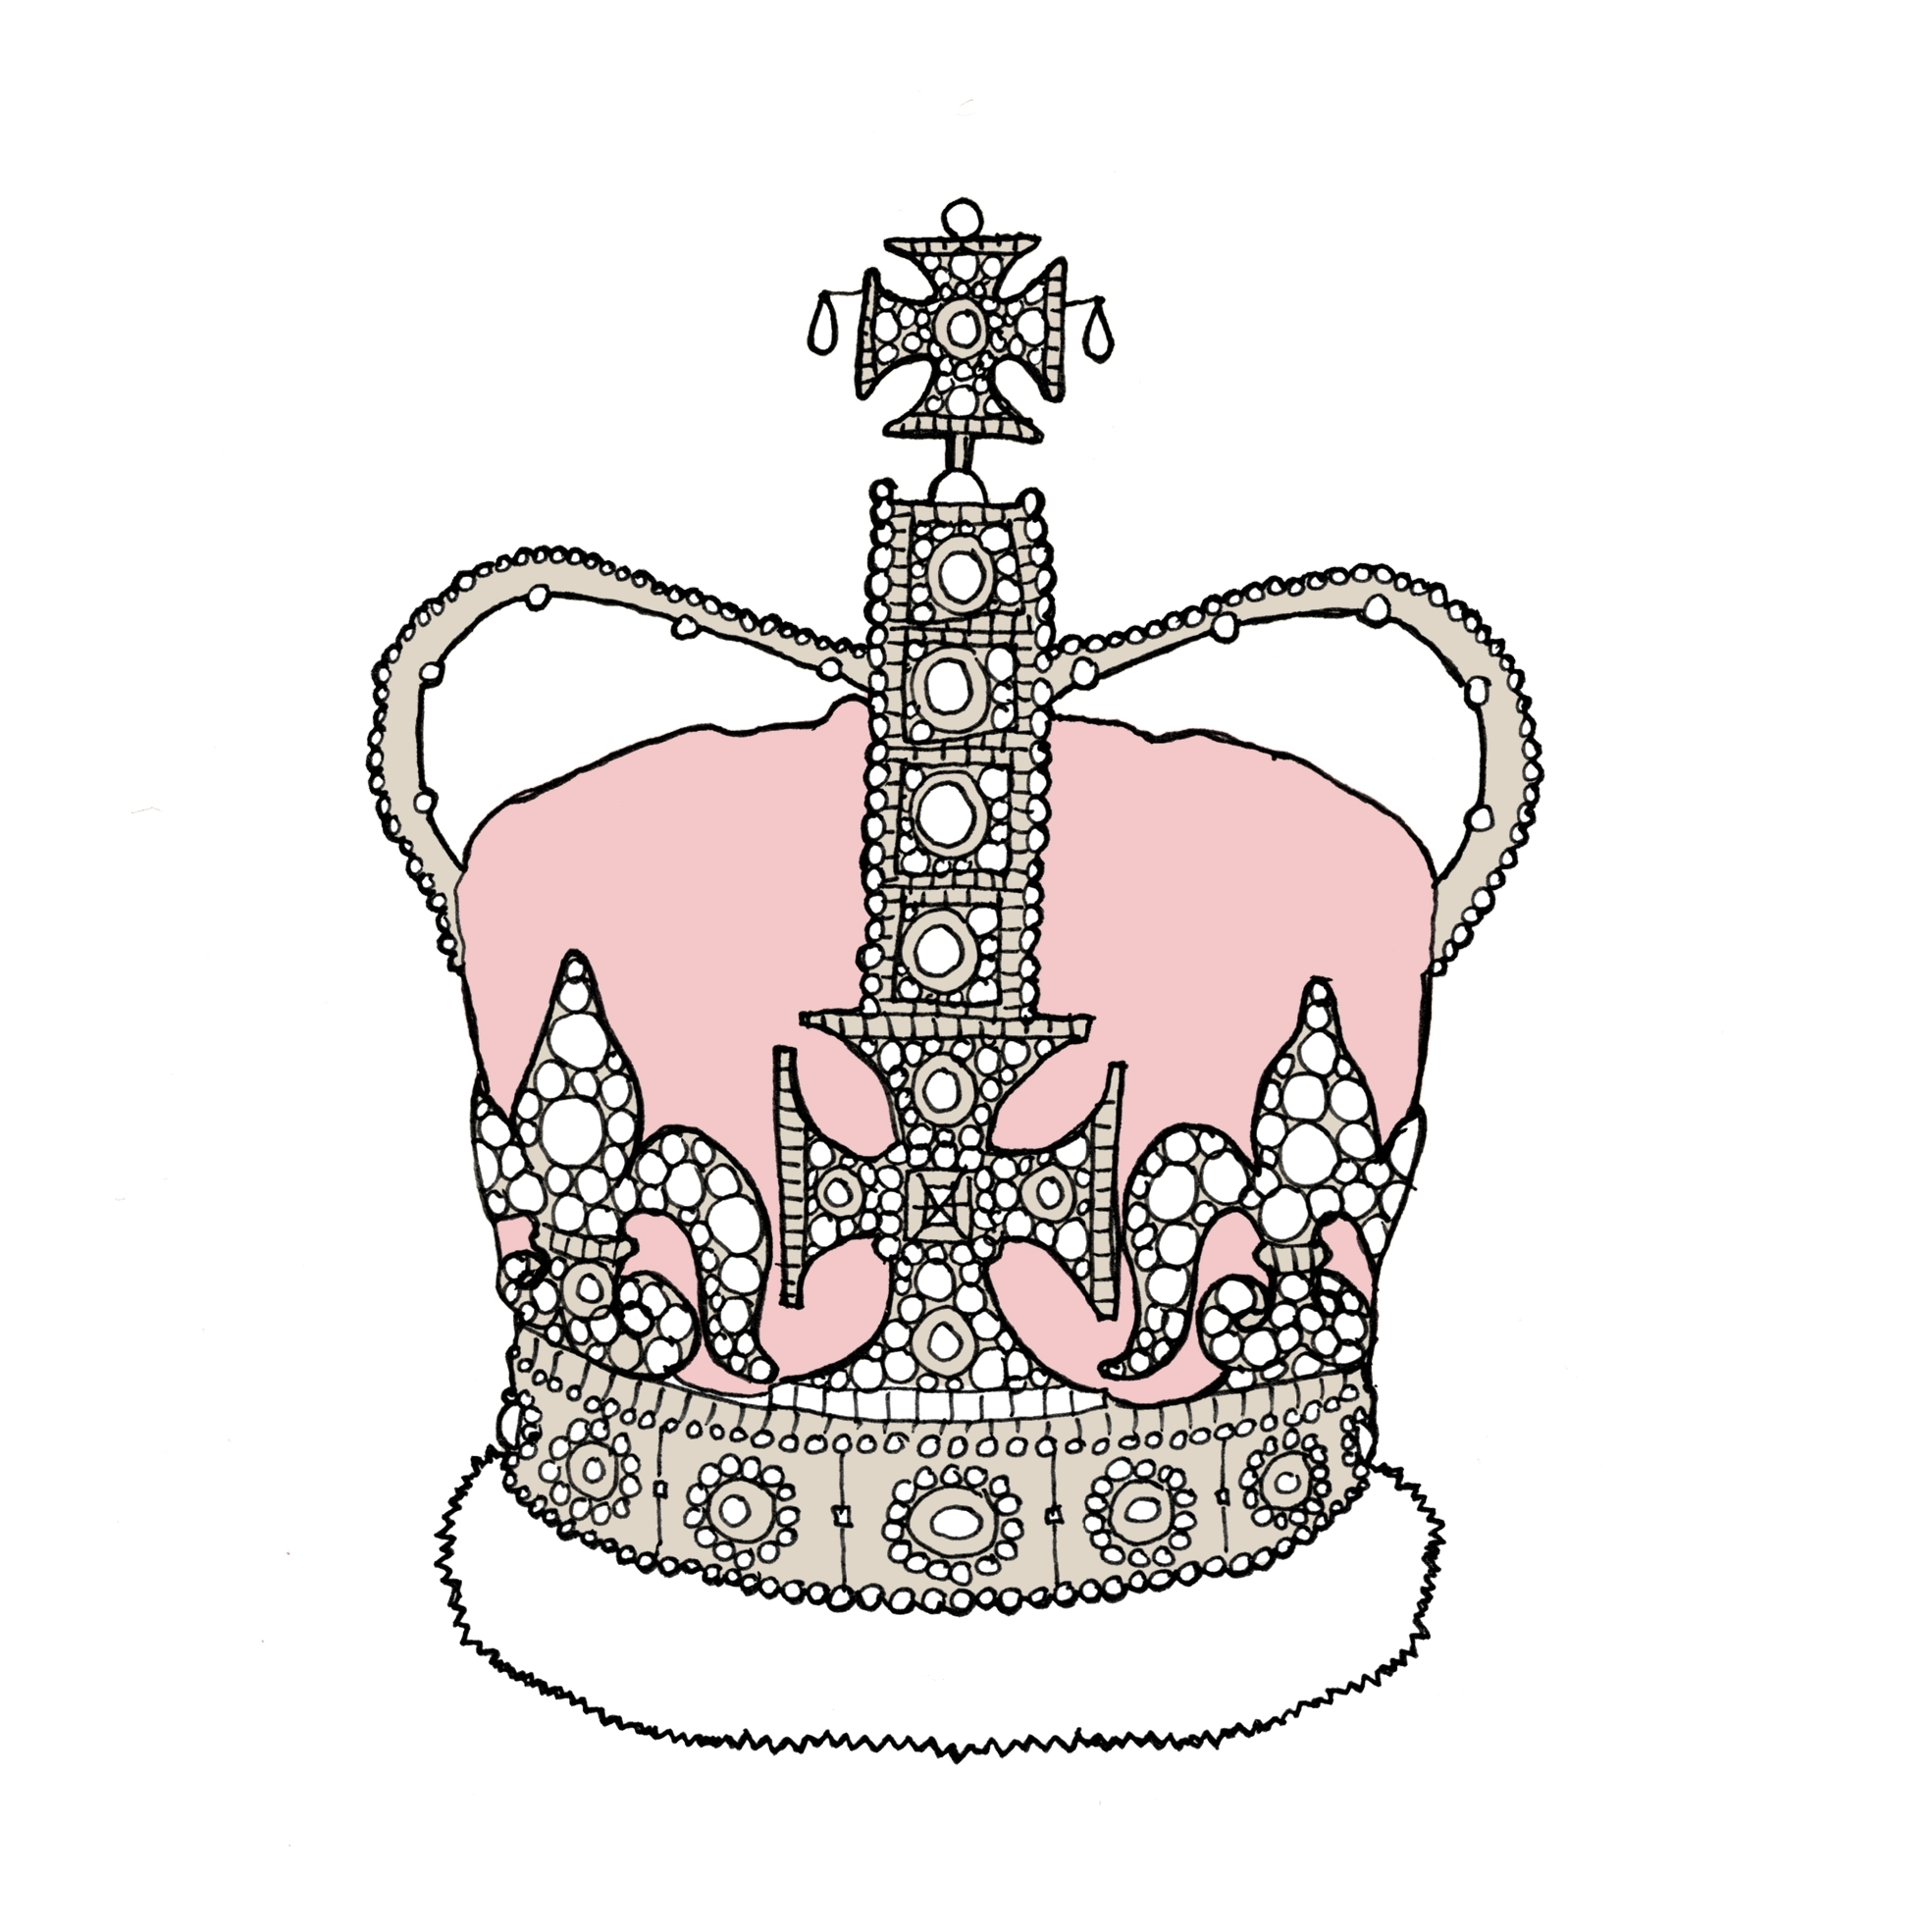 Princess Tiara Drawing at GetDrawings.com | Free for personal use ...